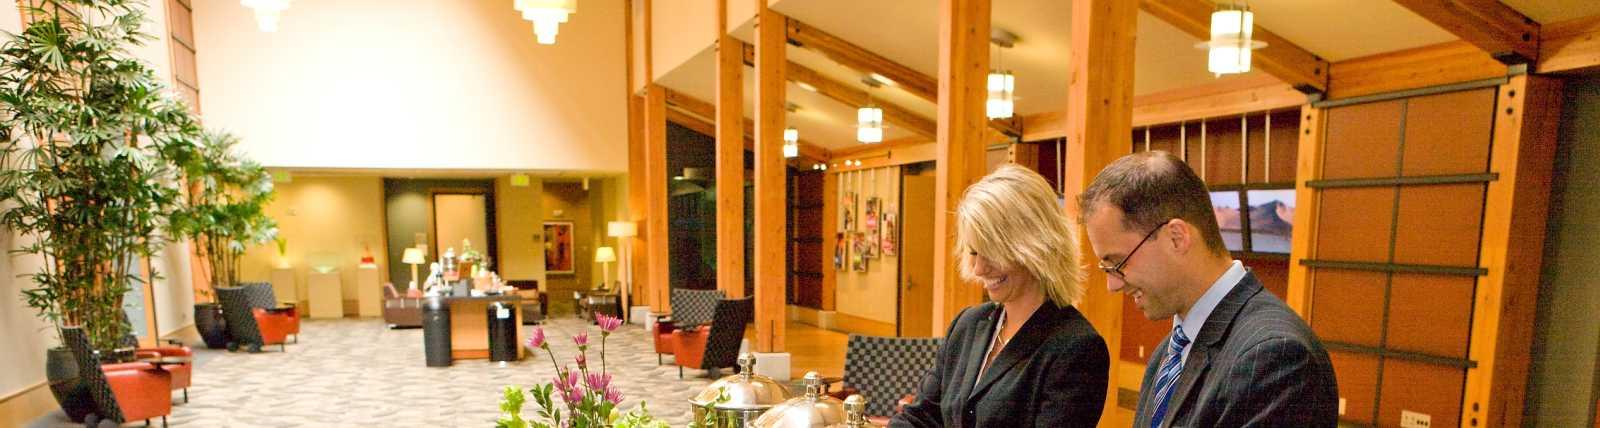 meeting-facility-Cedarbrook_Lodge_Meeting_Facility-5.jpg